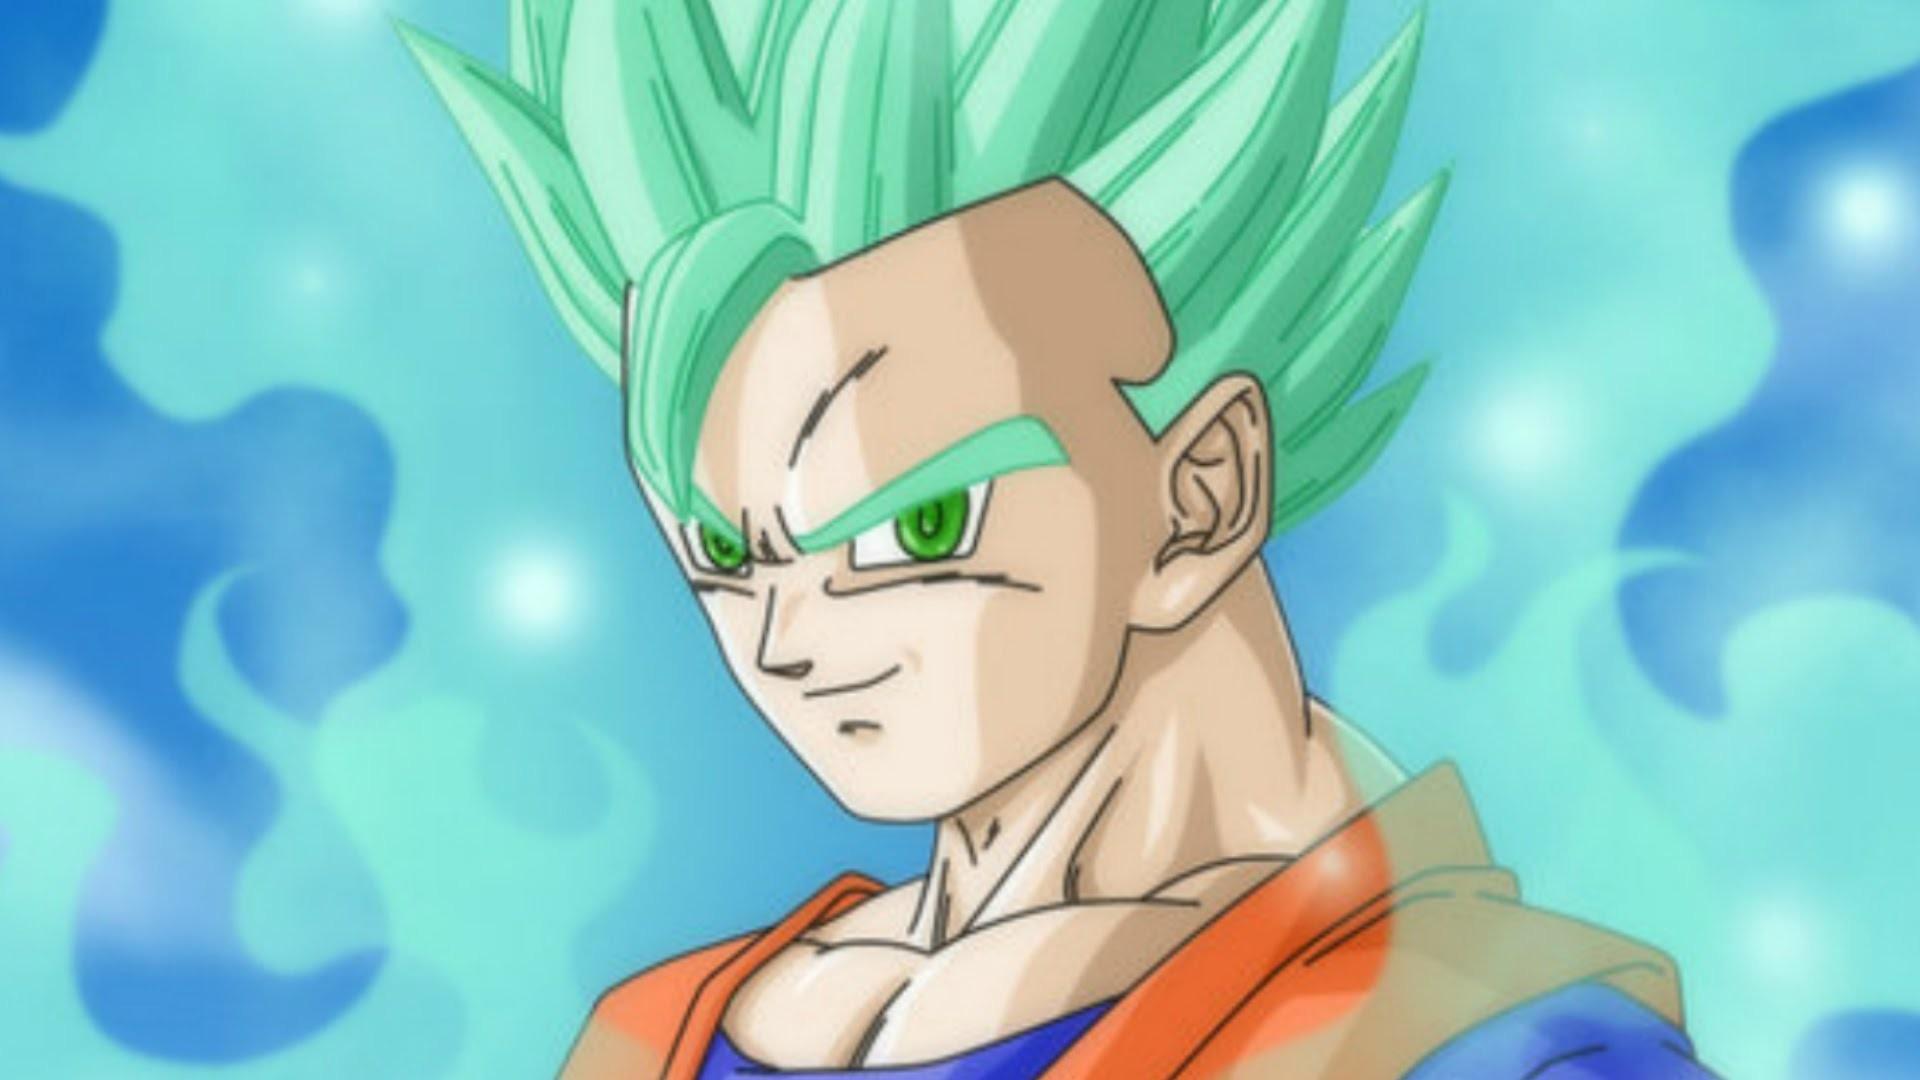 Gohan Super Saiyan God Super Saiyan 2 – Dragon Ball Super Theory